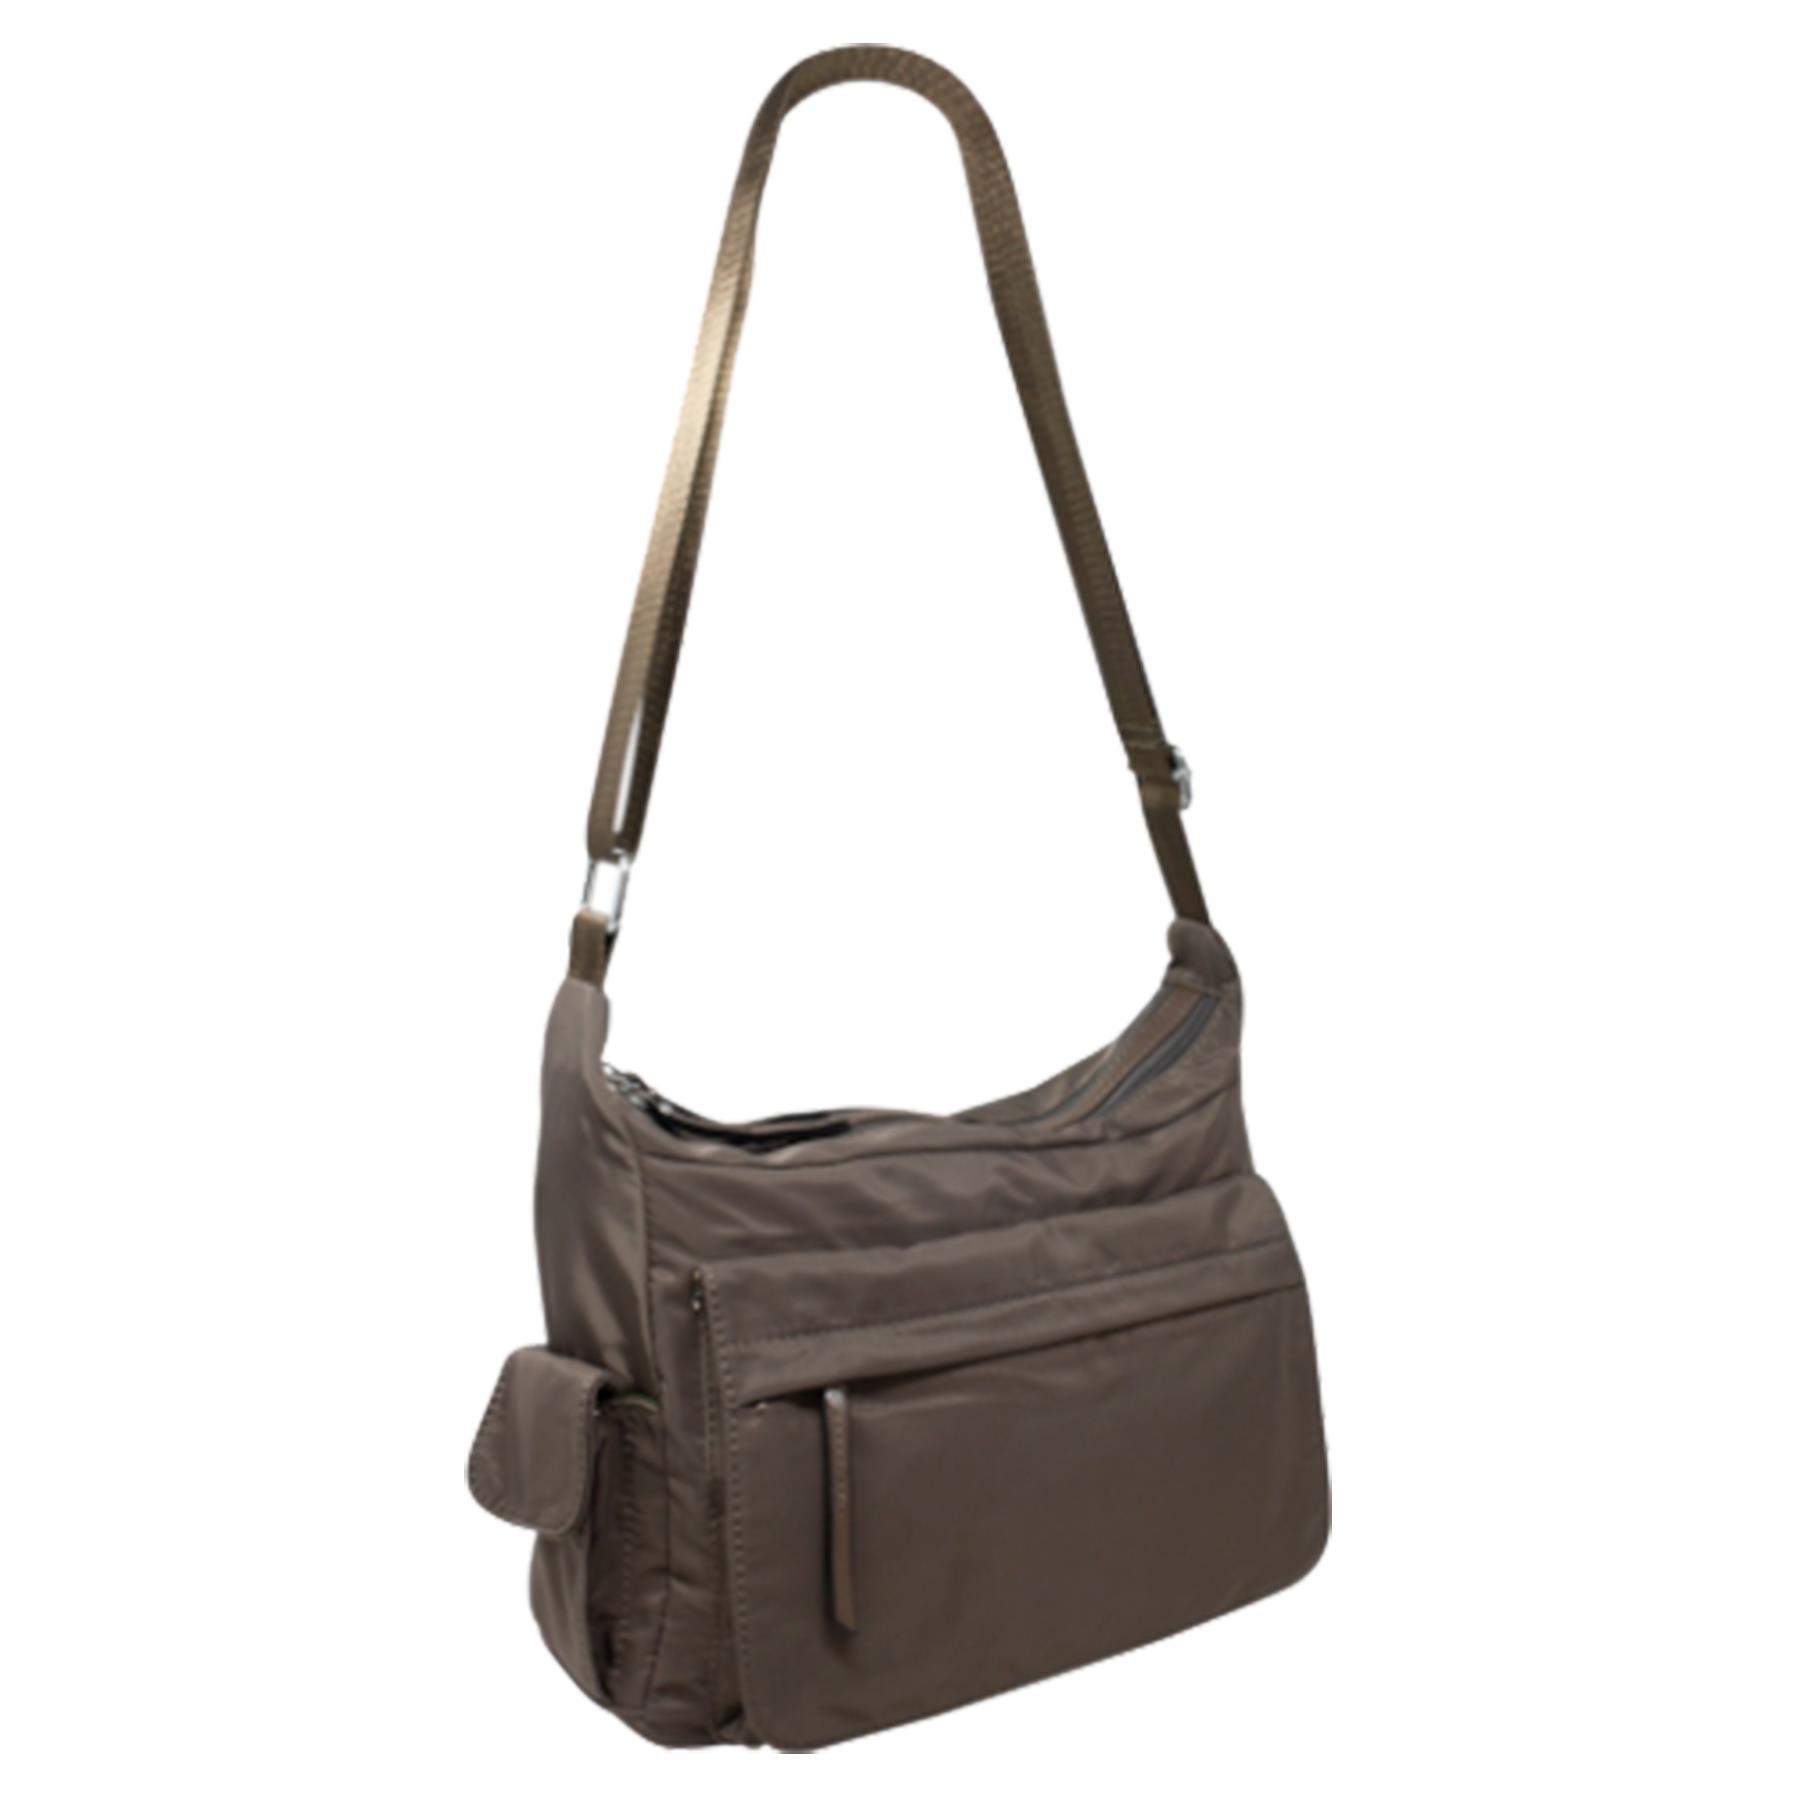 New-Ladies-Men-s-Showerproof-School-College-Practical-Basic-Crossbody-Bag thumbnail 38